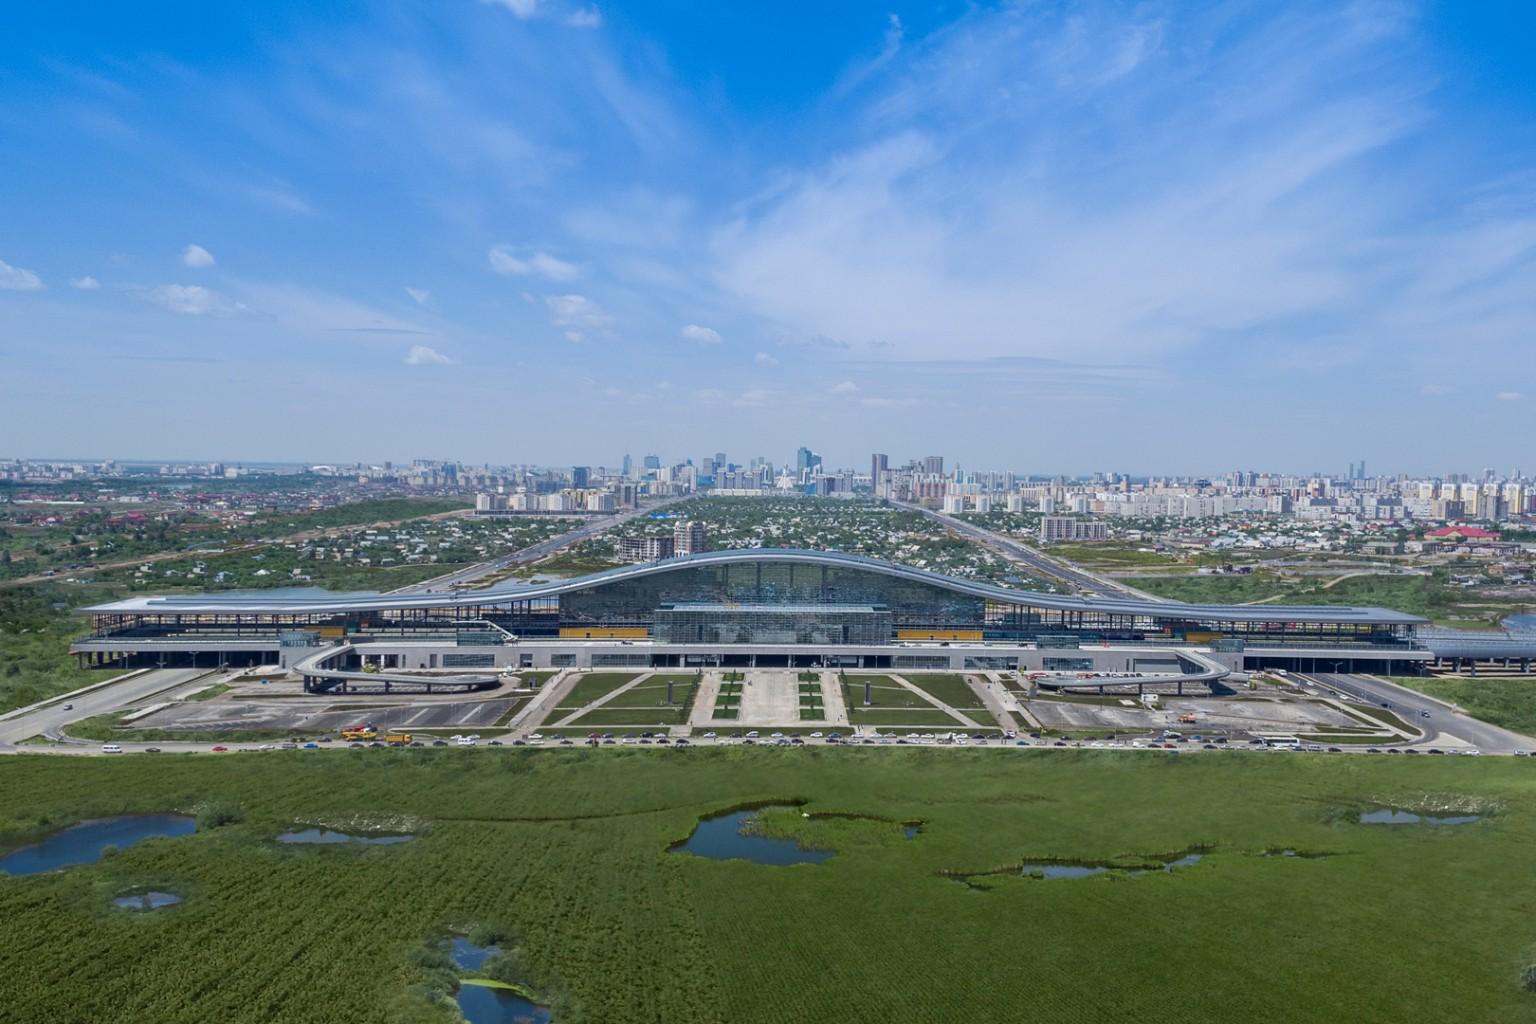 Astana_TrainStation_EmreDorter_DJI_0003_2